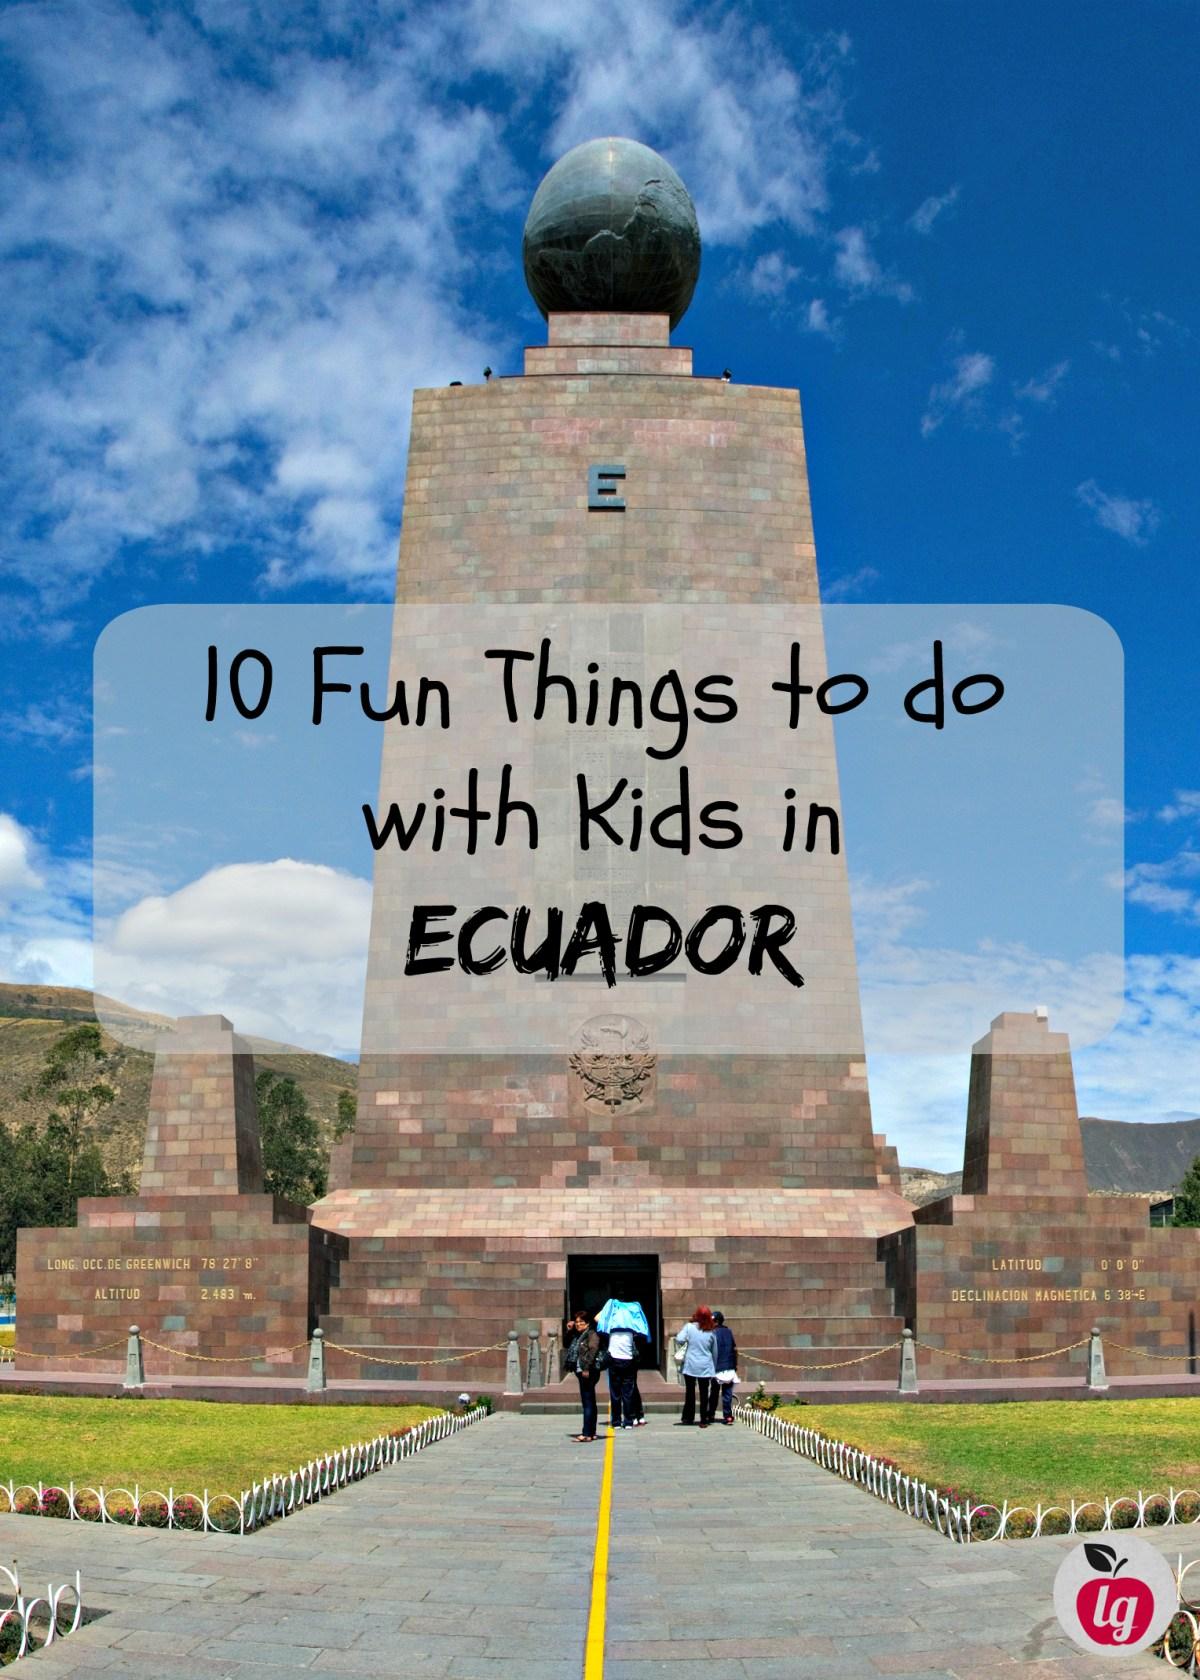 Fun things to do with kids in Ecuador